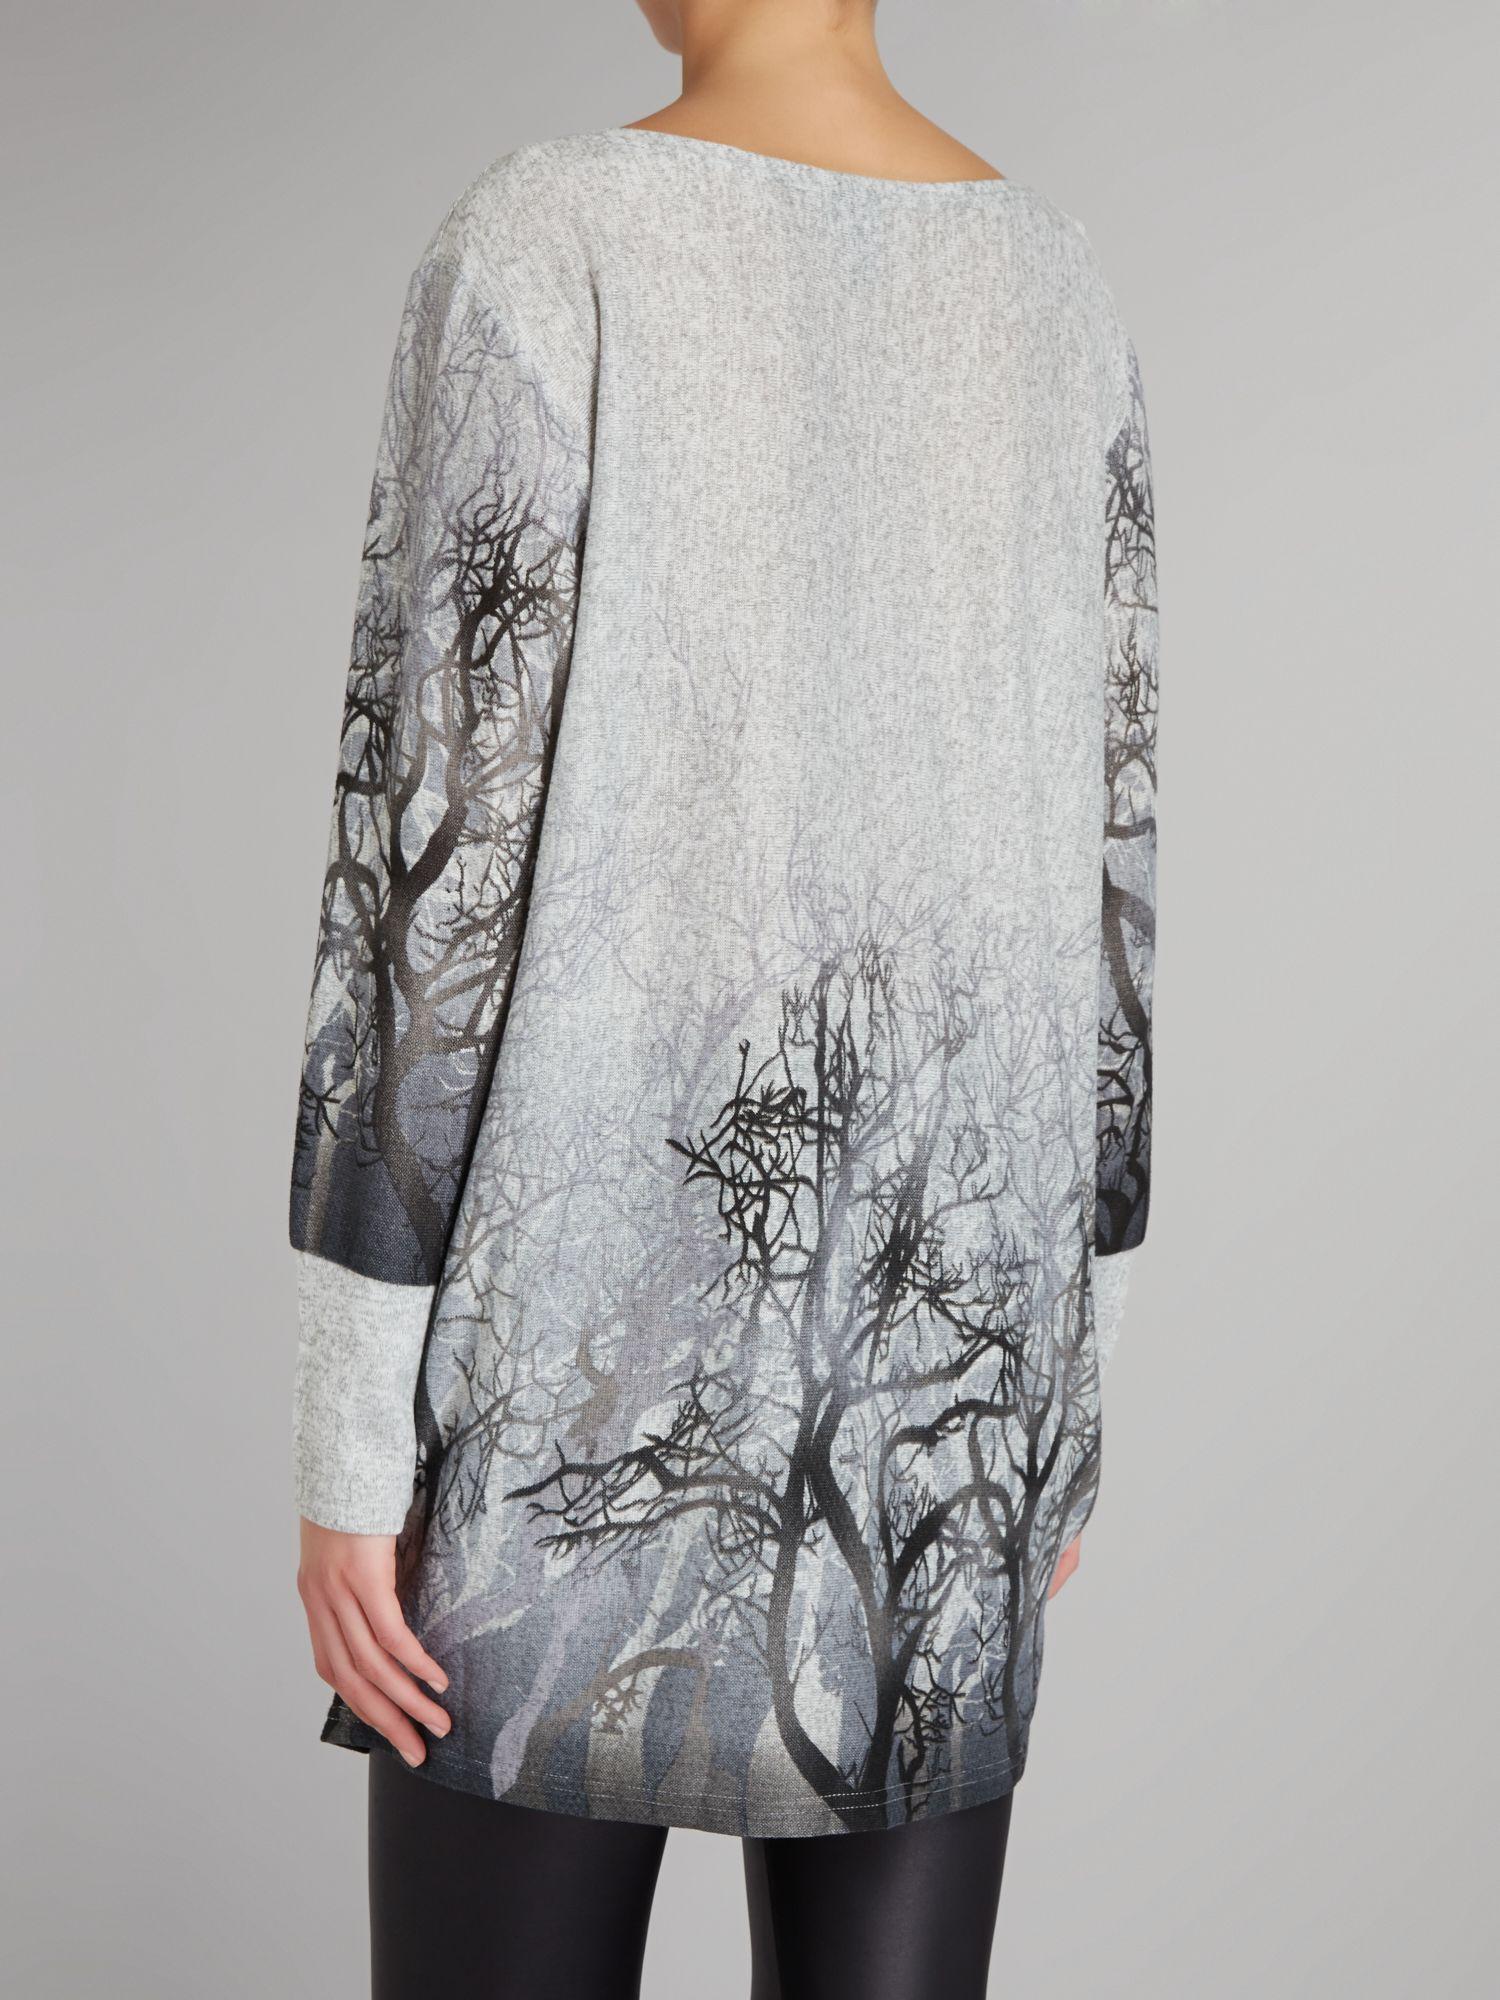 Izabel London Wool Forest Print Jumper in Grey (Grey)